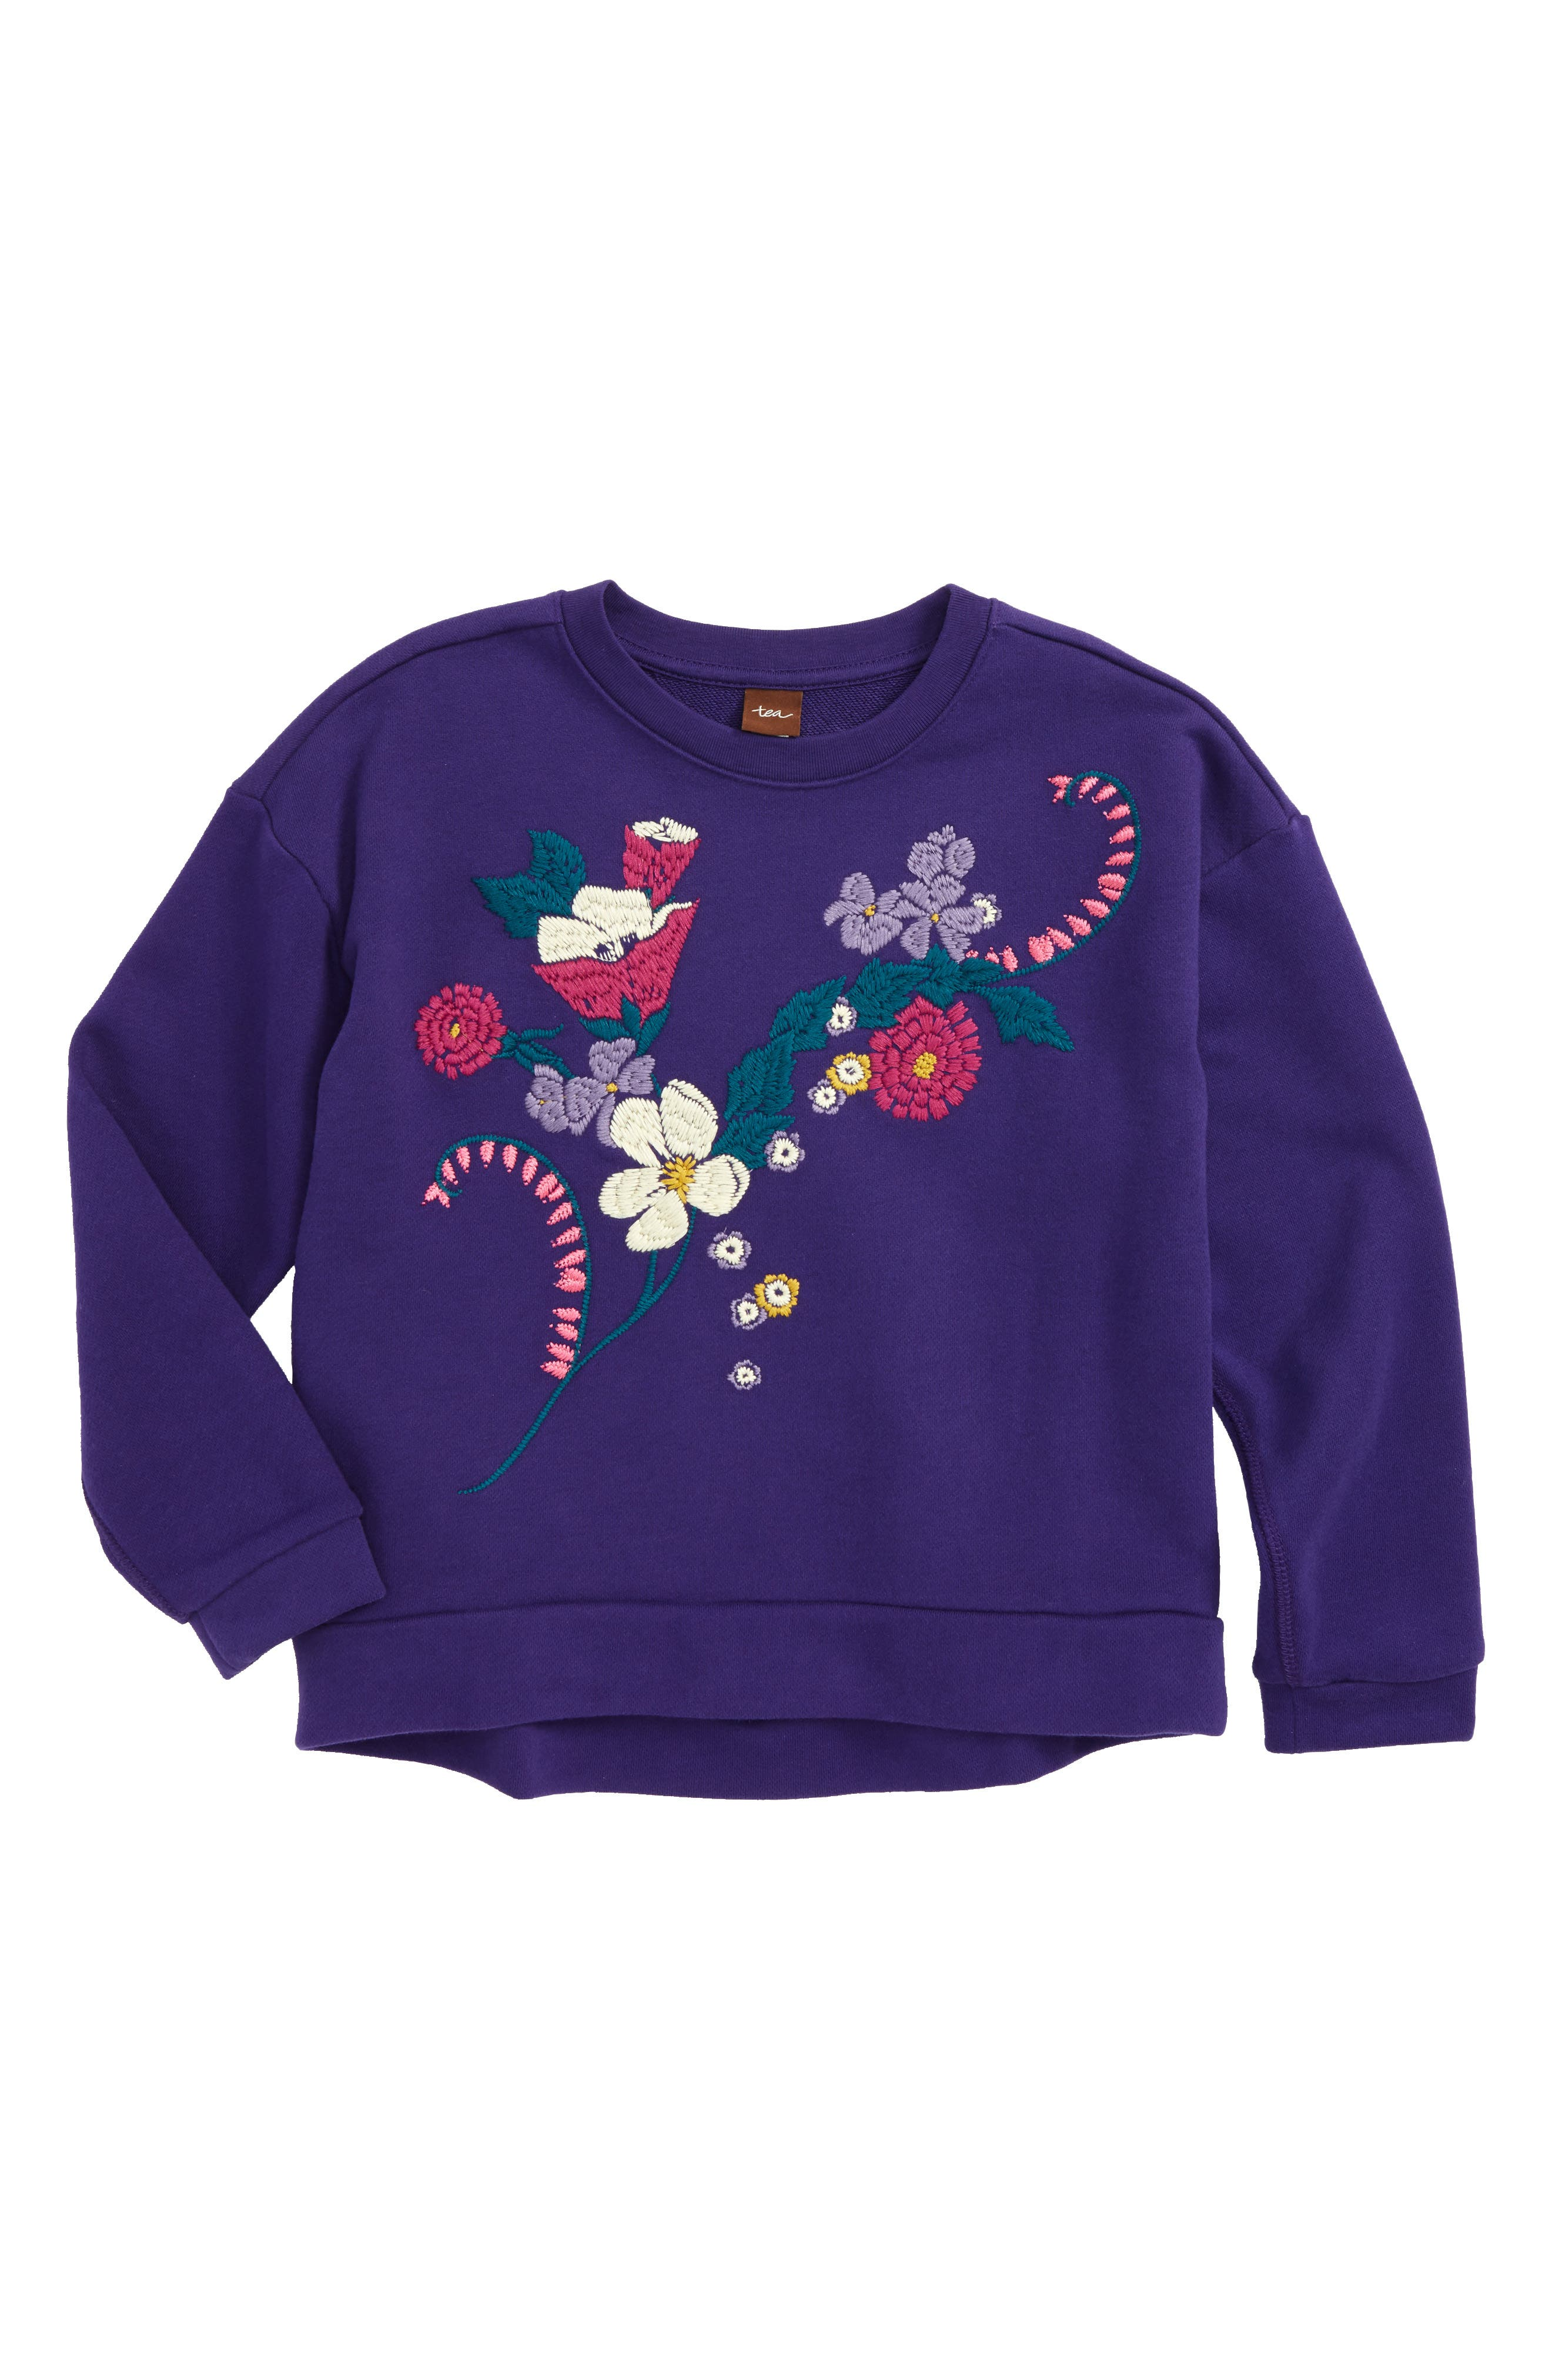 Main Image - Tea Collection Primrose Embroidered Sweatshirt (Toddler Girls, Little Girls & Big Girls)